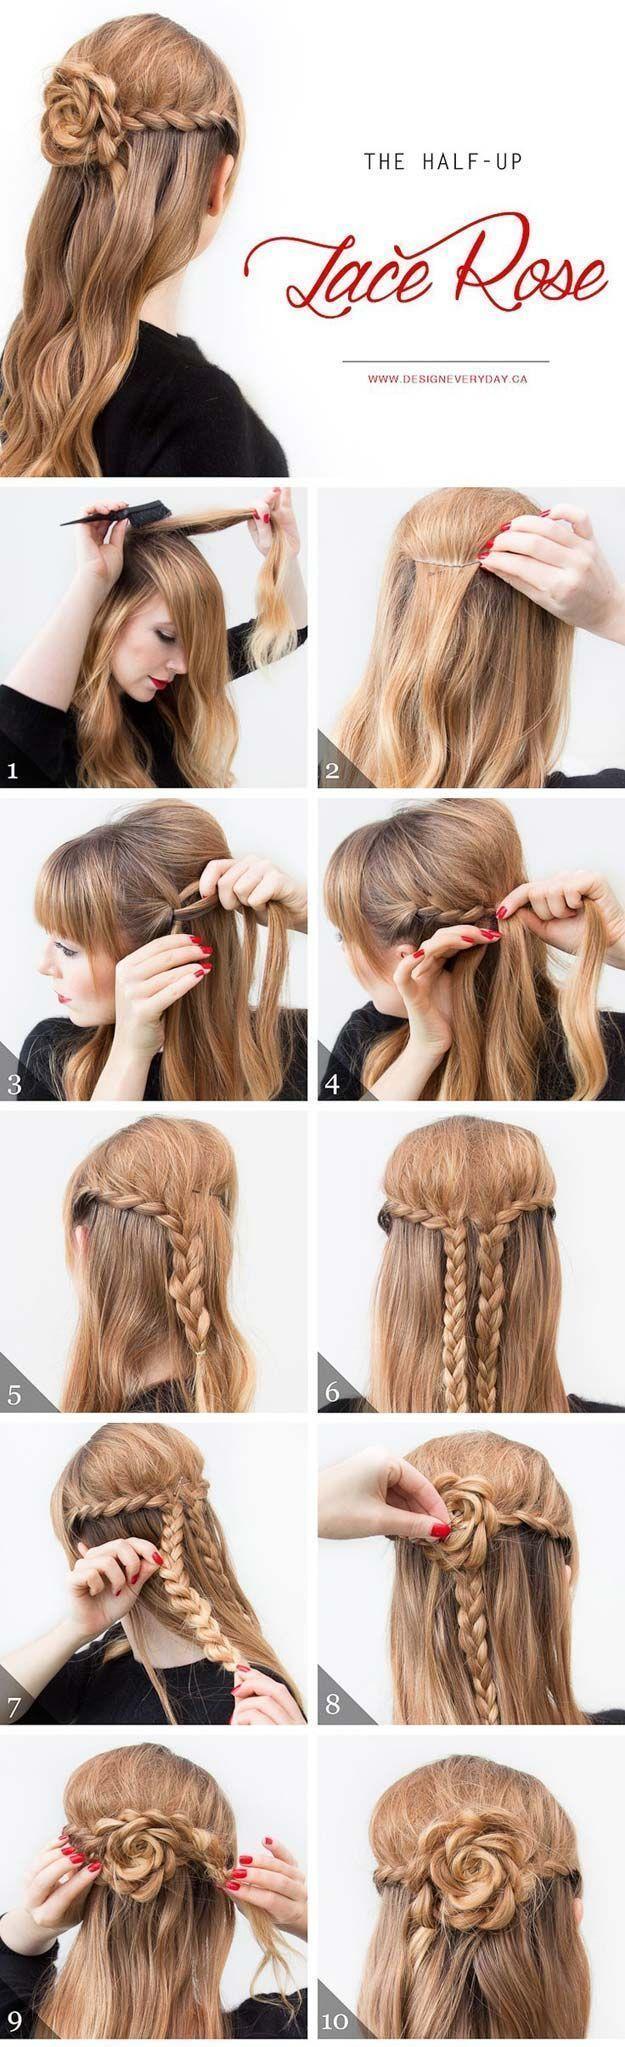 Hairstyles tumblr tutorial bun